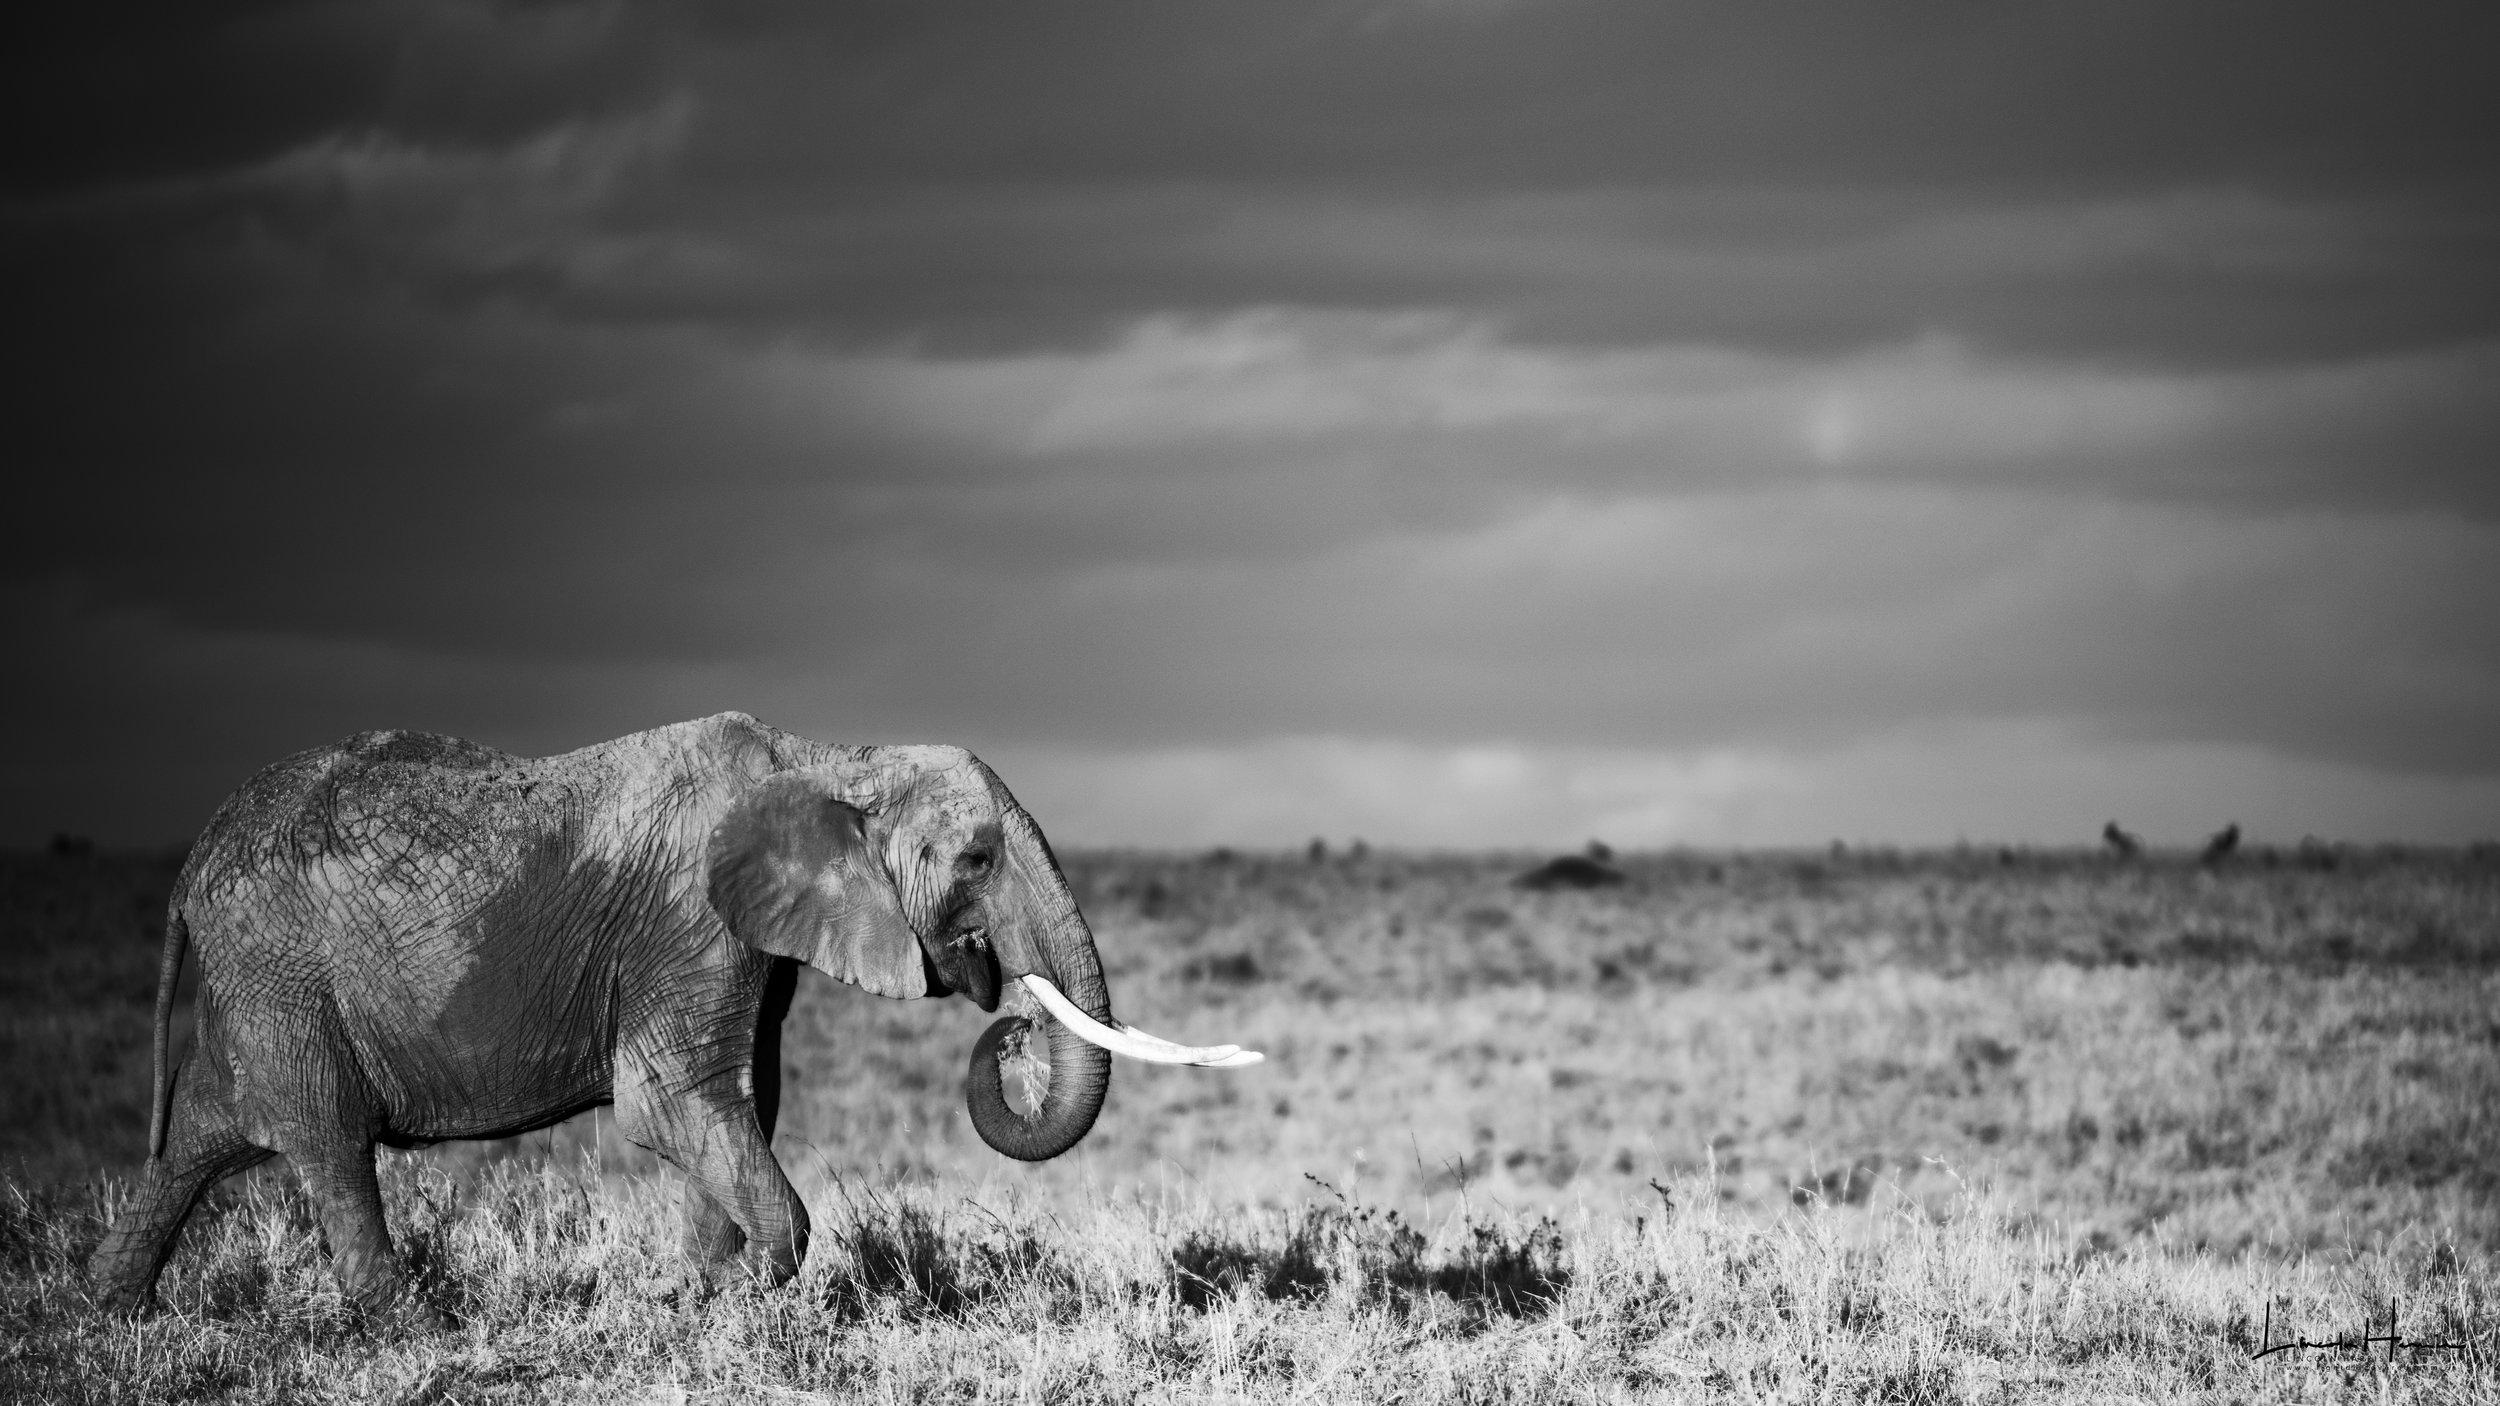 Ele Grazing elephant under the clouds 16x9 bw mm 2017.jpg